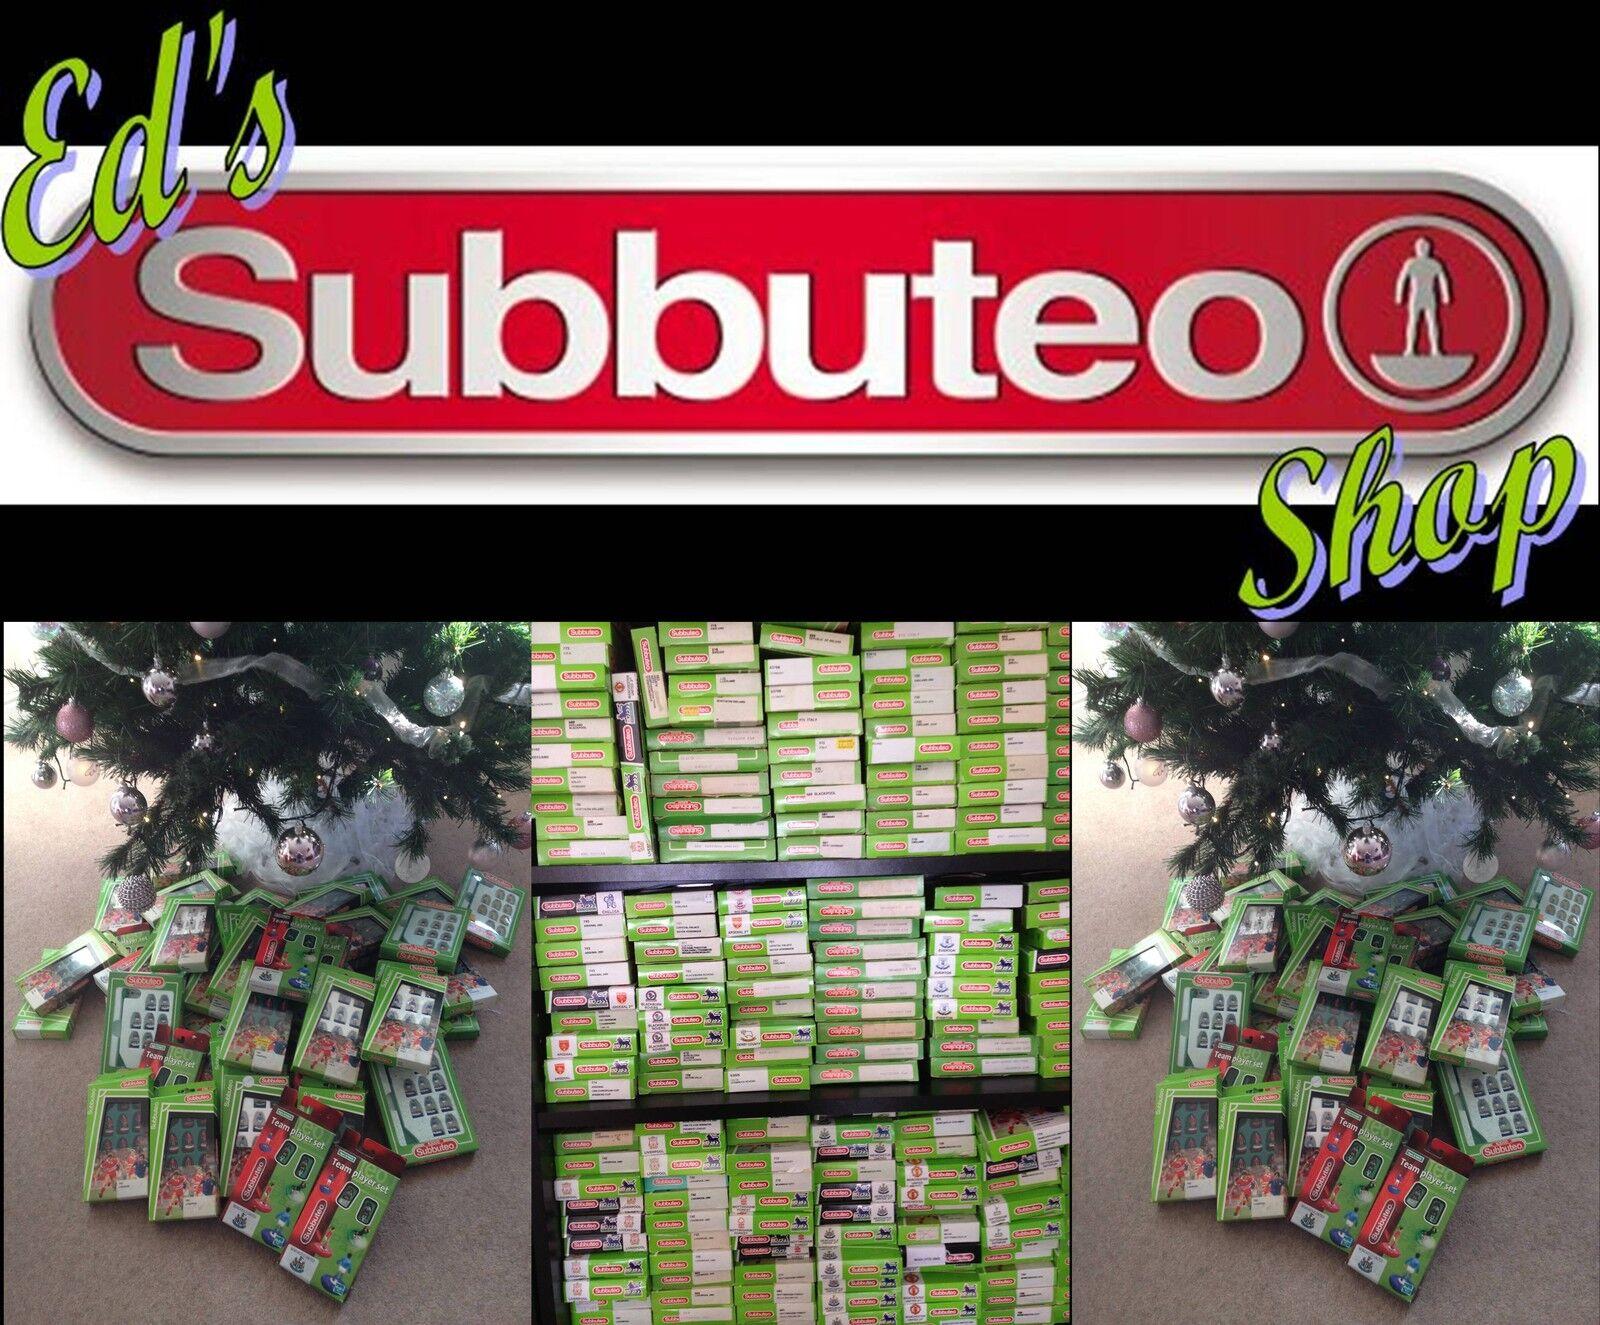 Ed s Subbuteo Shop